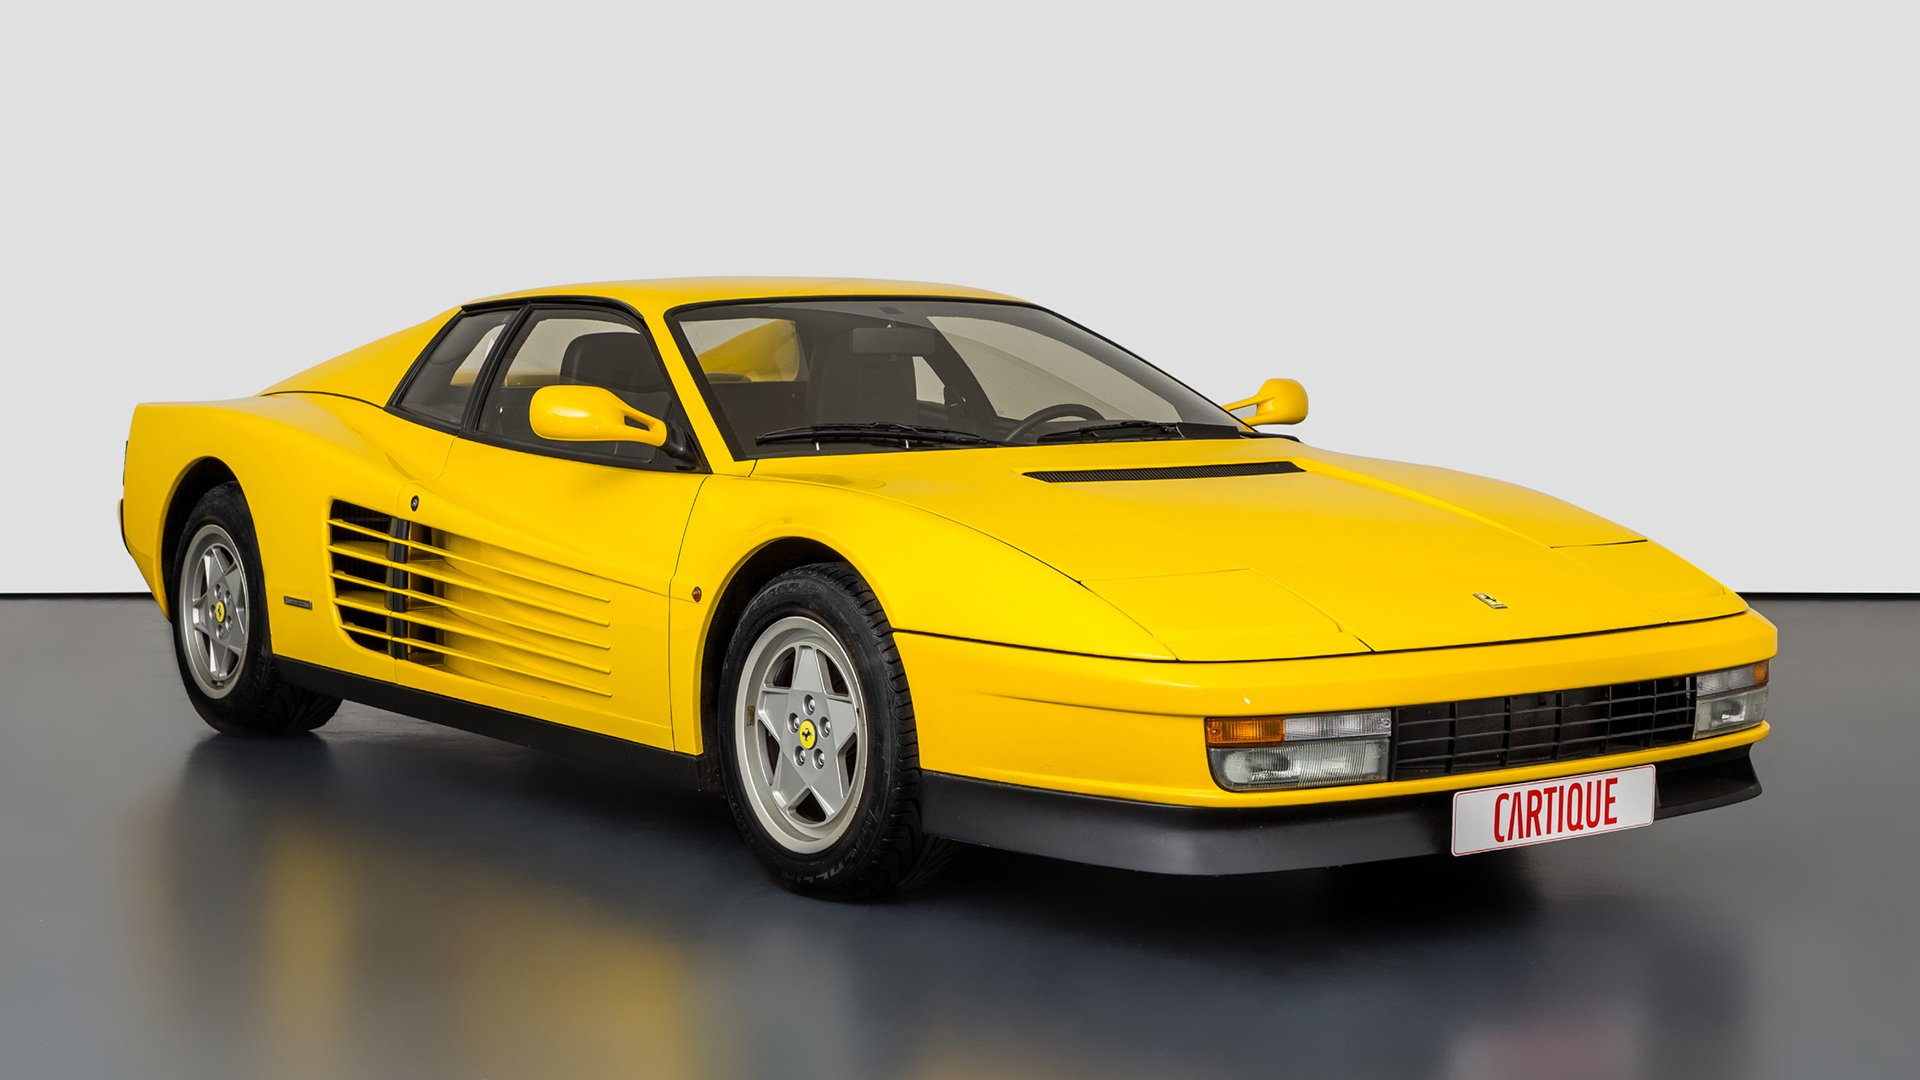 1989 Ferrari Testarossa In Steinheim An Der Murr Baden Württemberg Germany For Sale 11013213